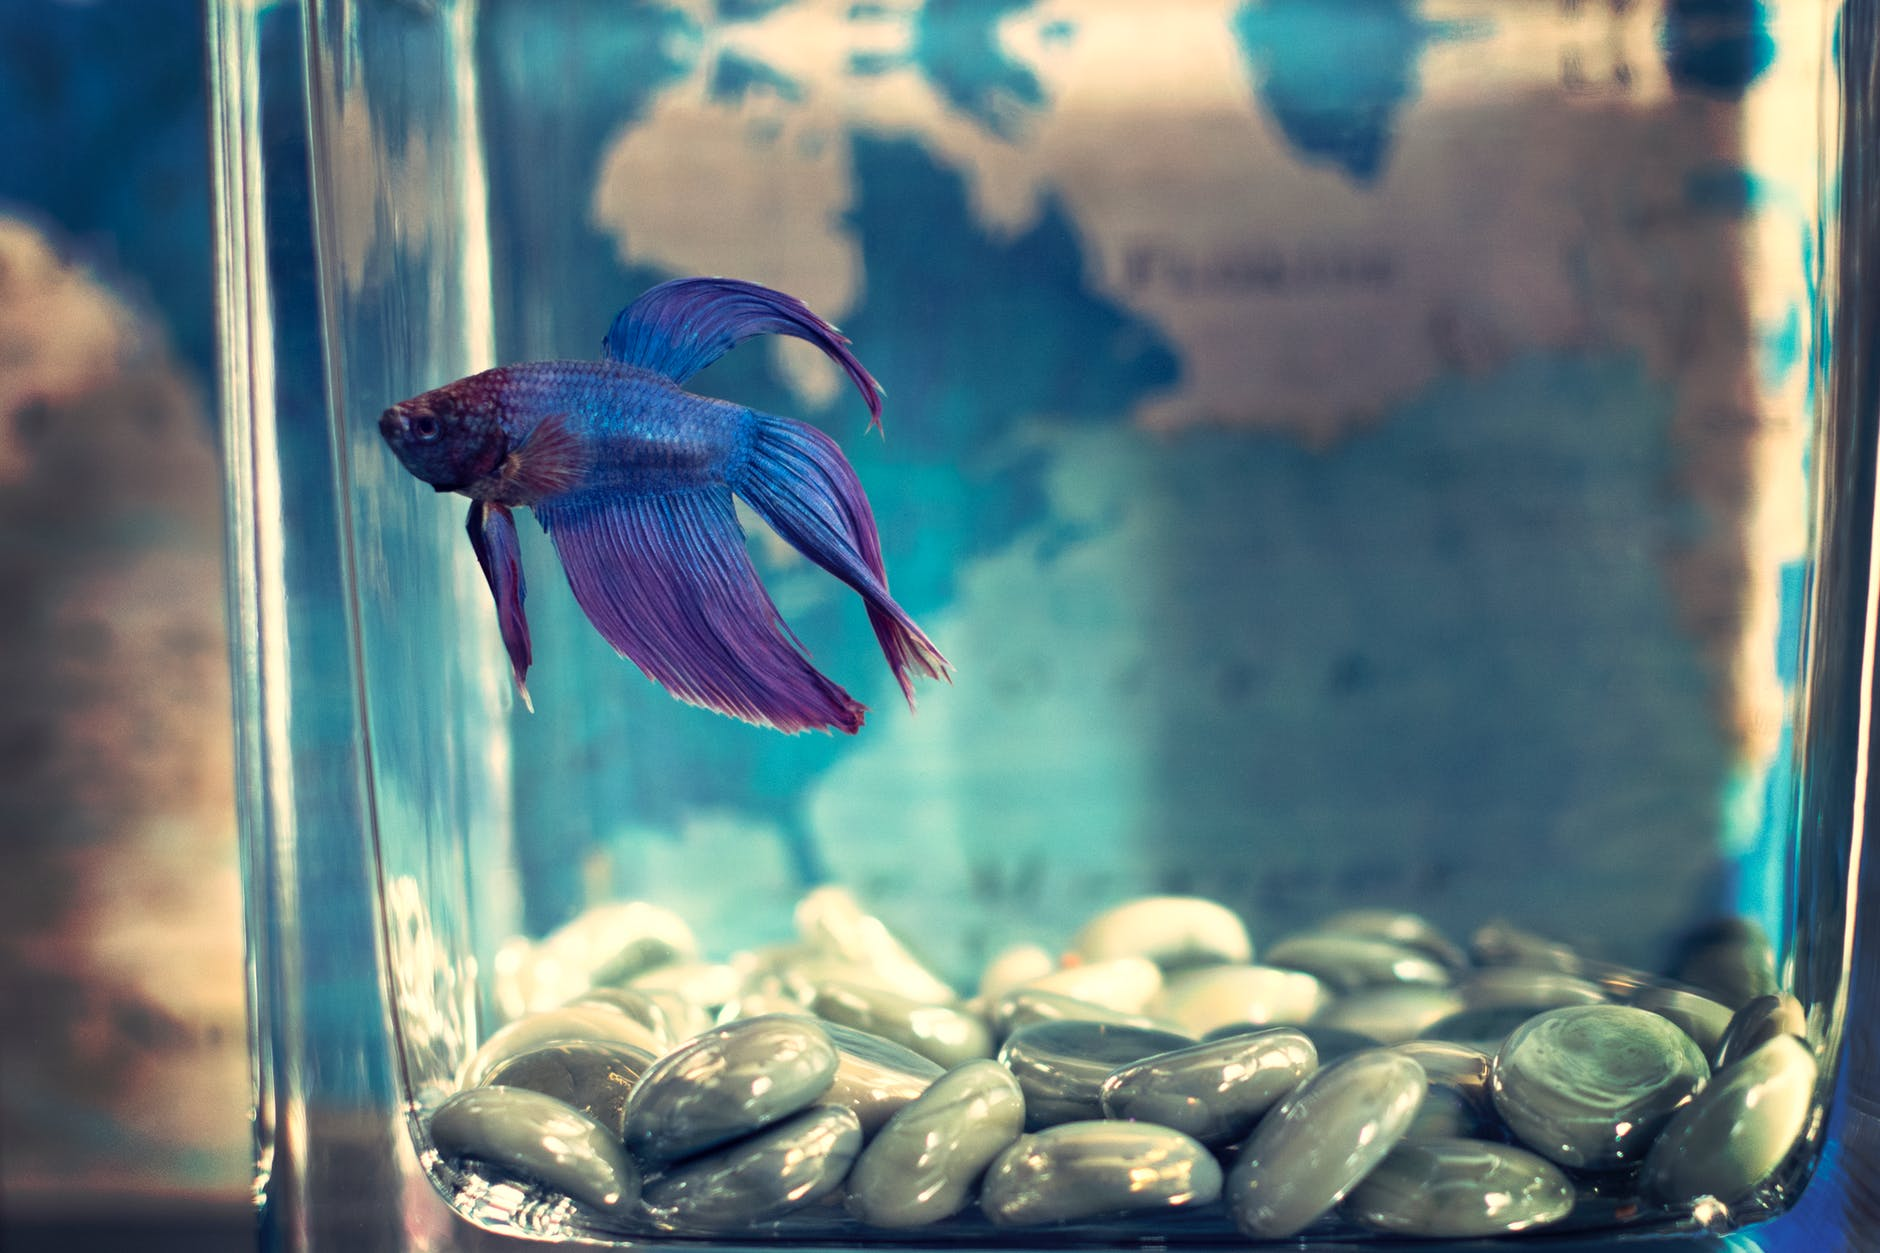 steps to clean a betta fish tank